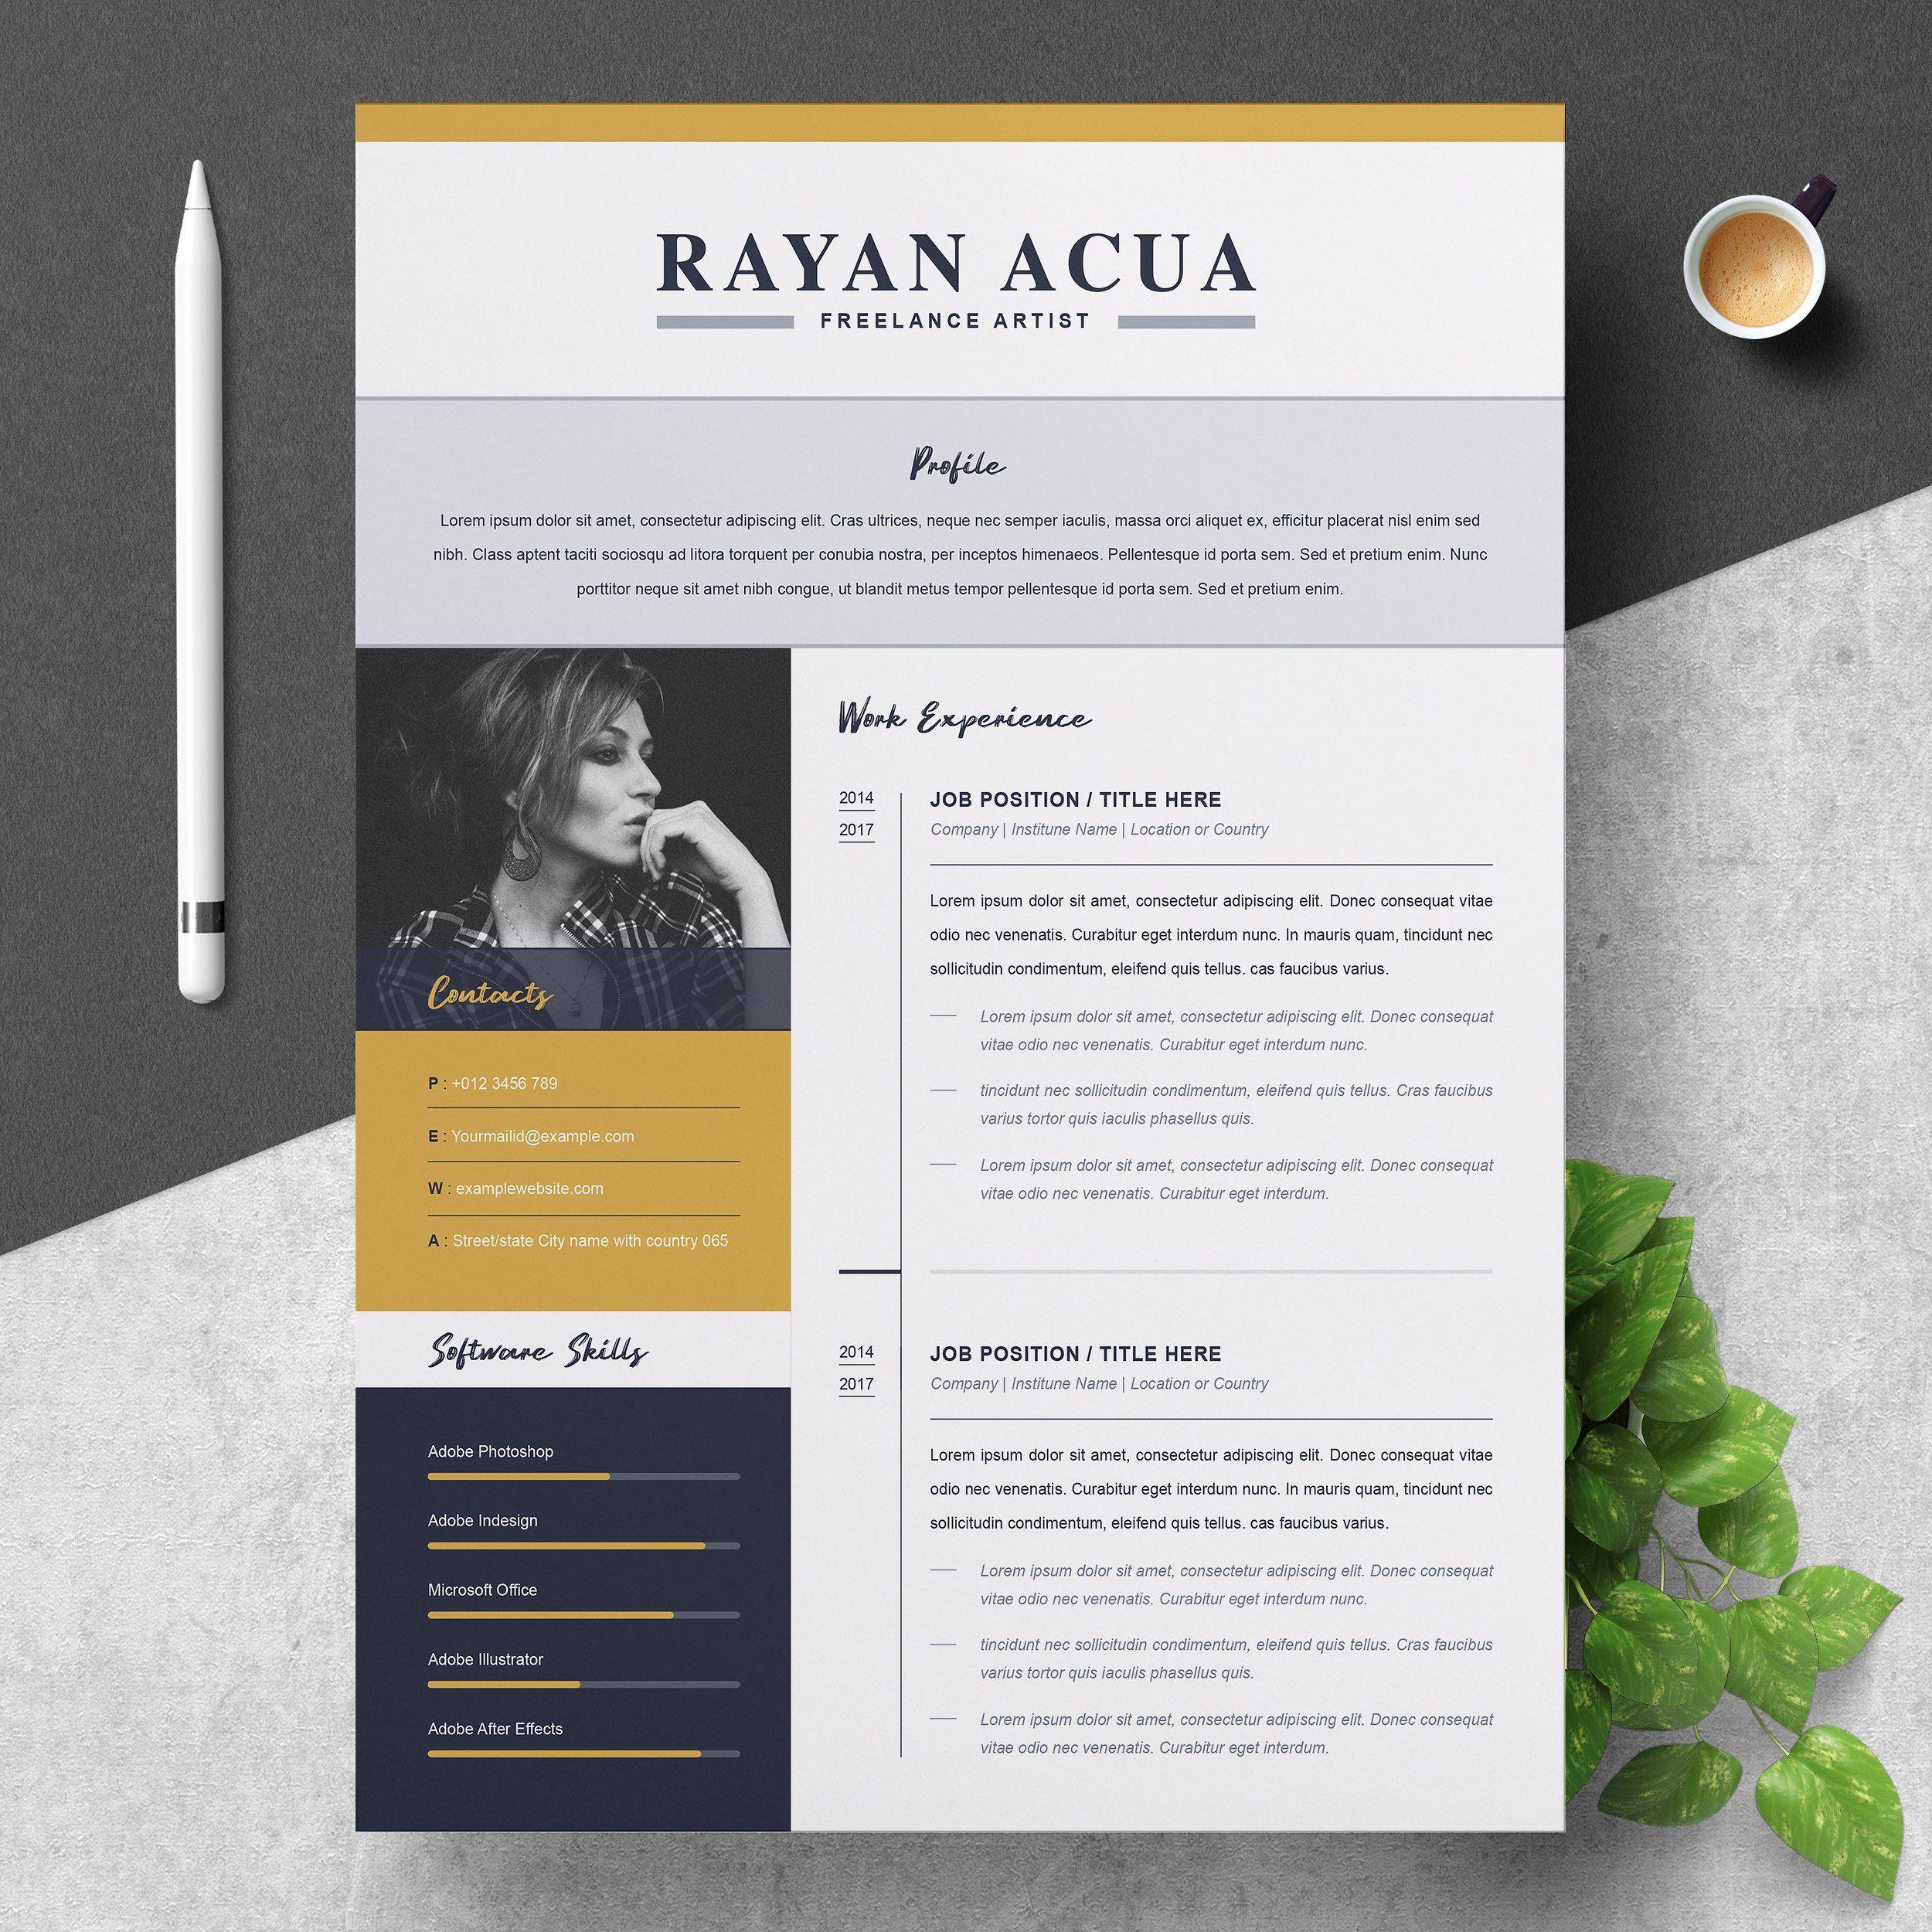 Professional Resume Template Resume, Professional resume